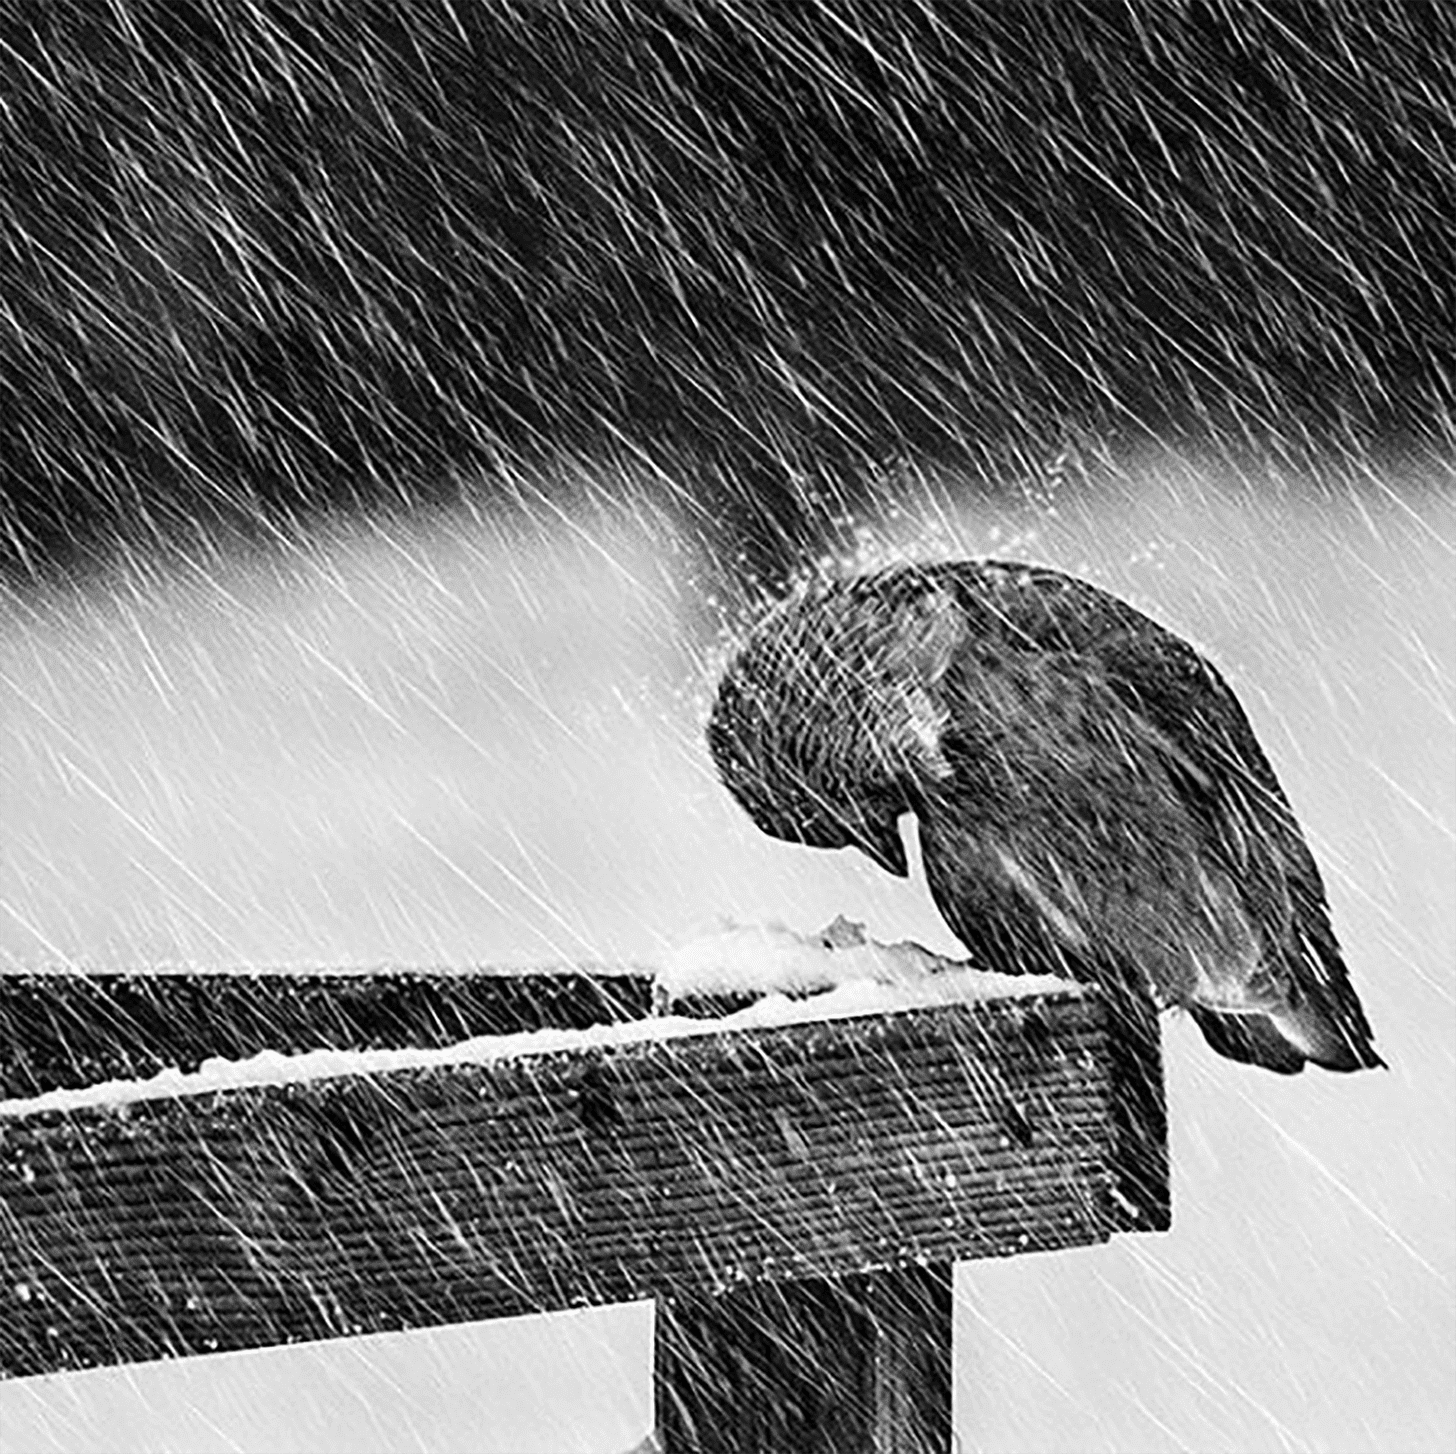 A bird with its head bowed against the rain by Mikael Sundberg